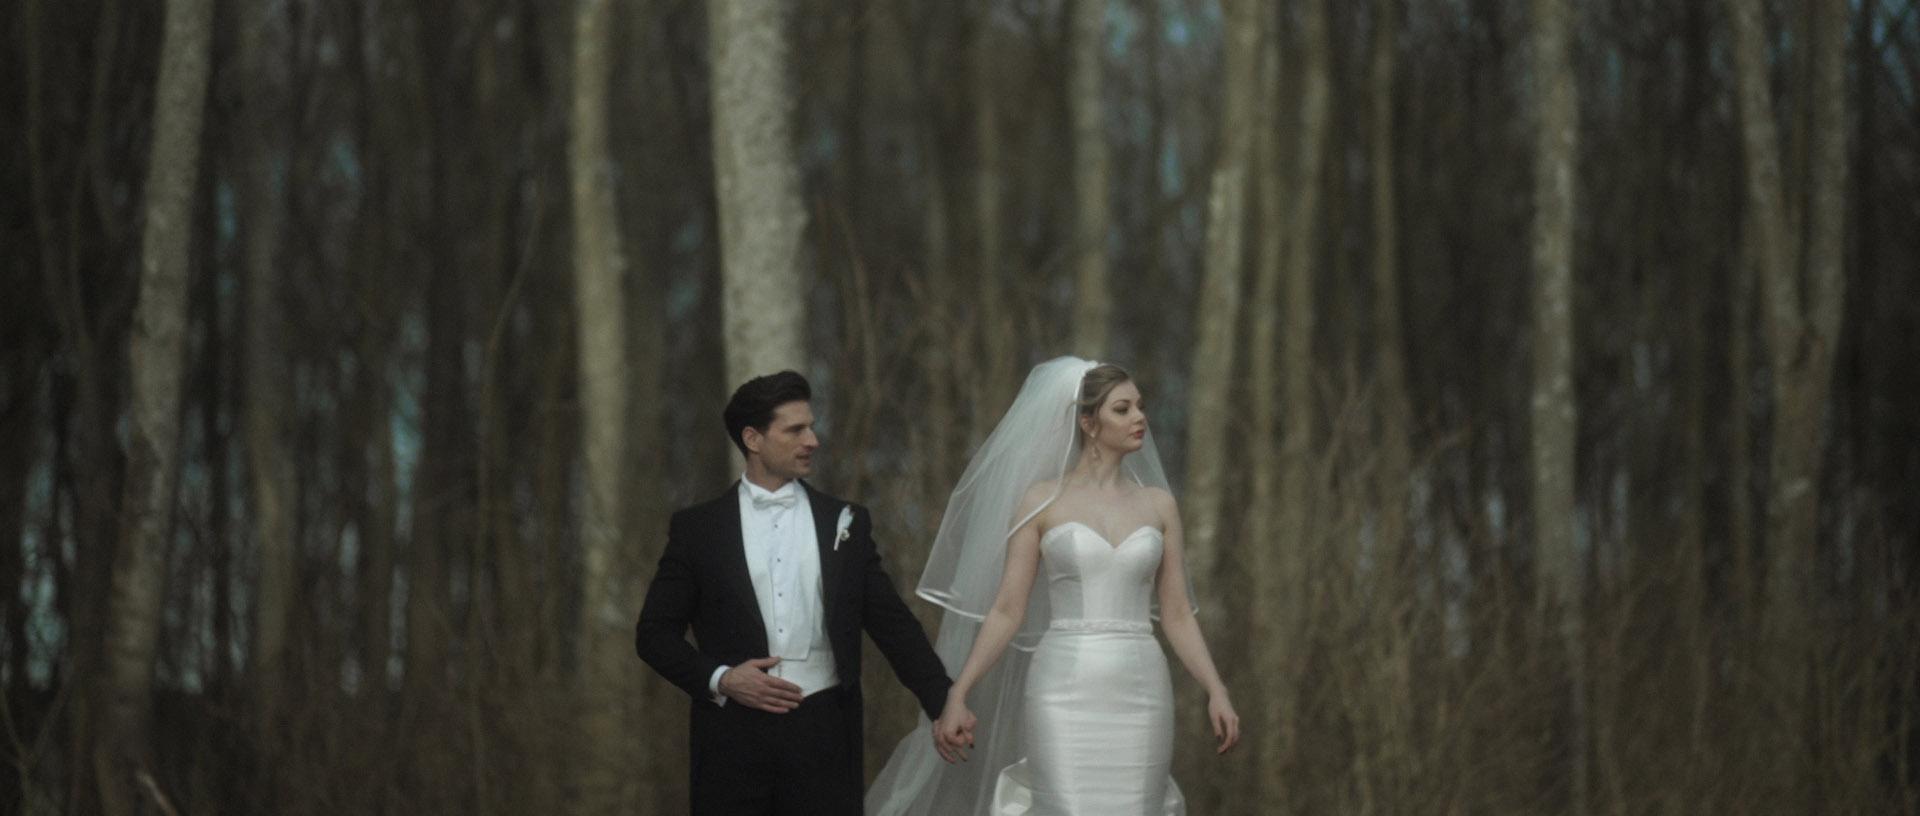 moon+river+wedding+videographer+north+east+uk+london